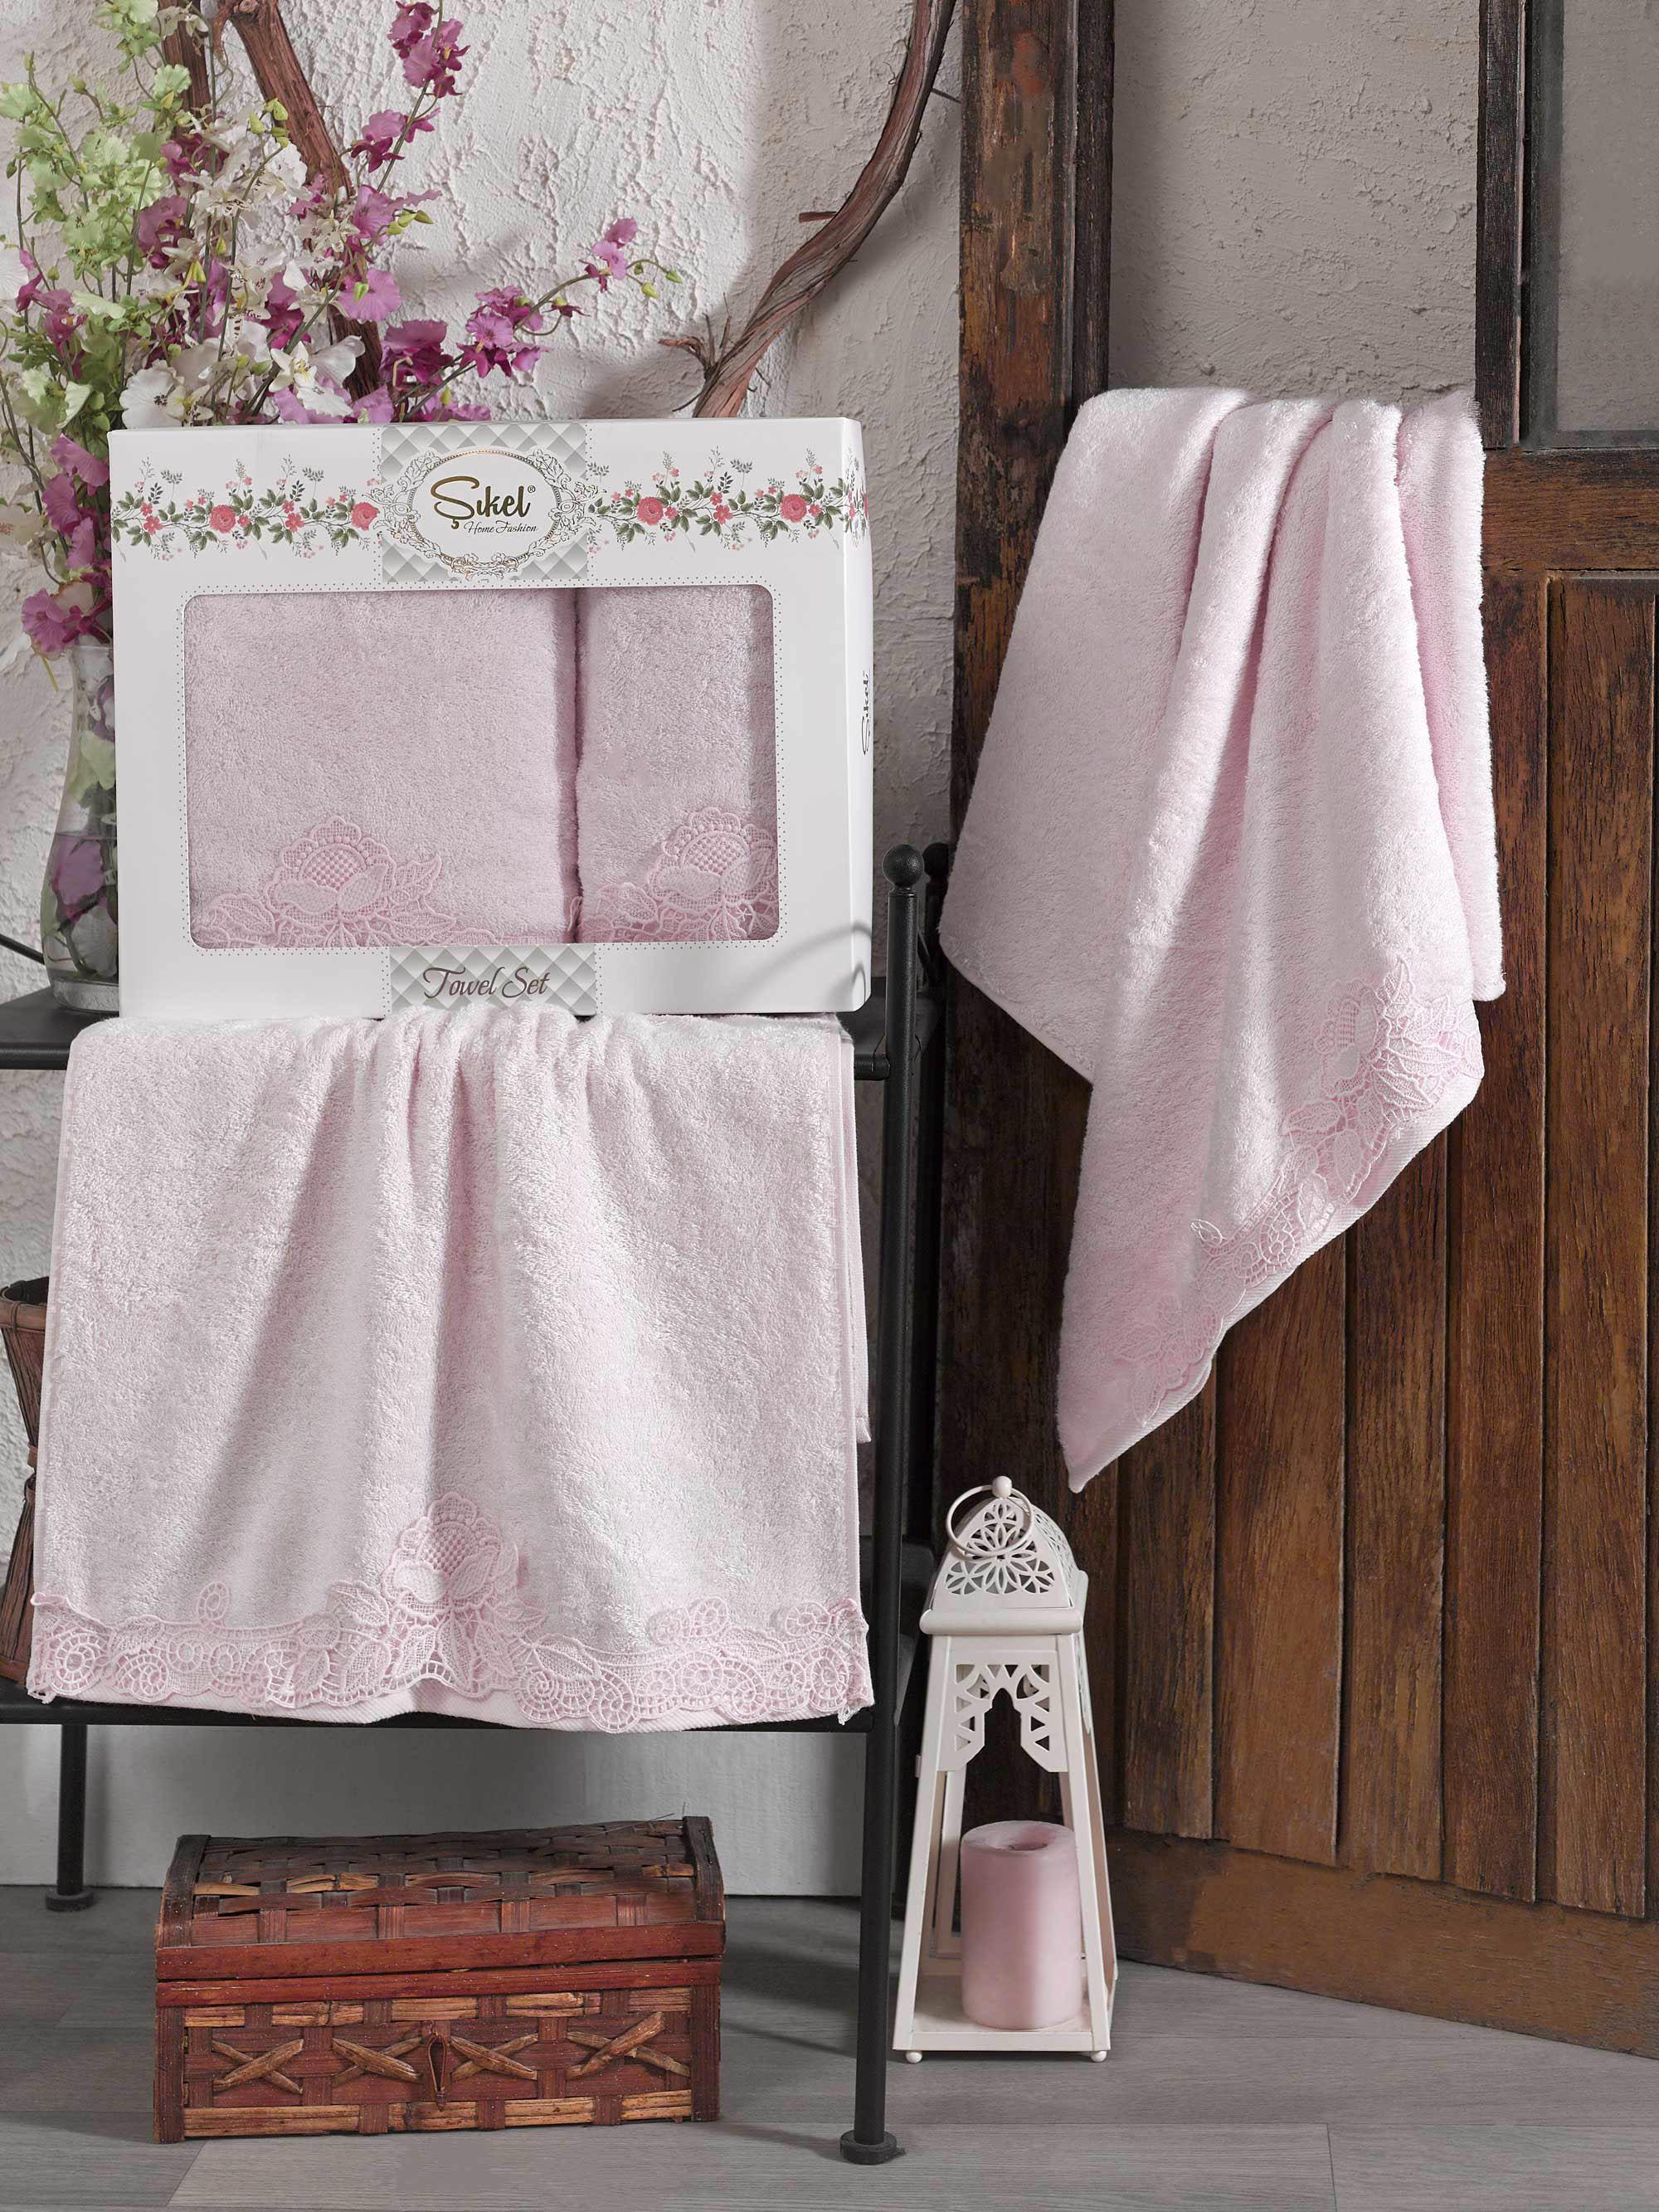 Полотенца Sikel Полотенце Berhamis Цвет: Розовый (50х90 см,70х140 см) sikel набор из 2 полотенец nazande цвет коричневый